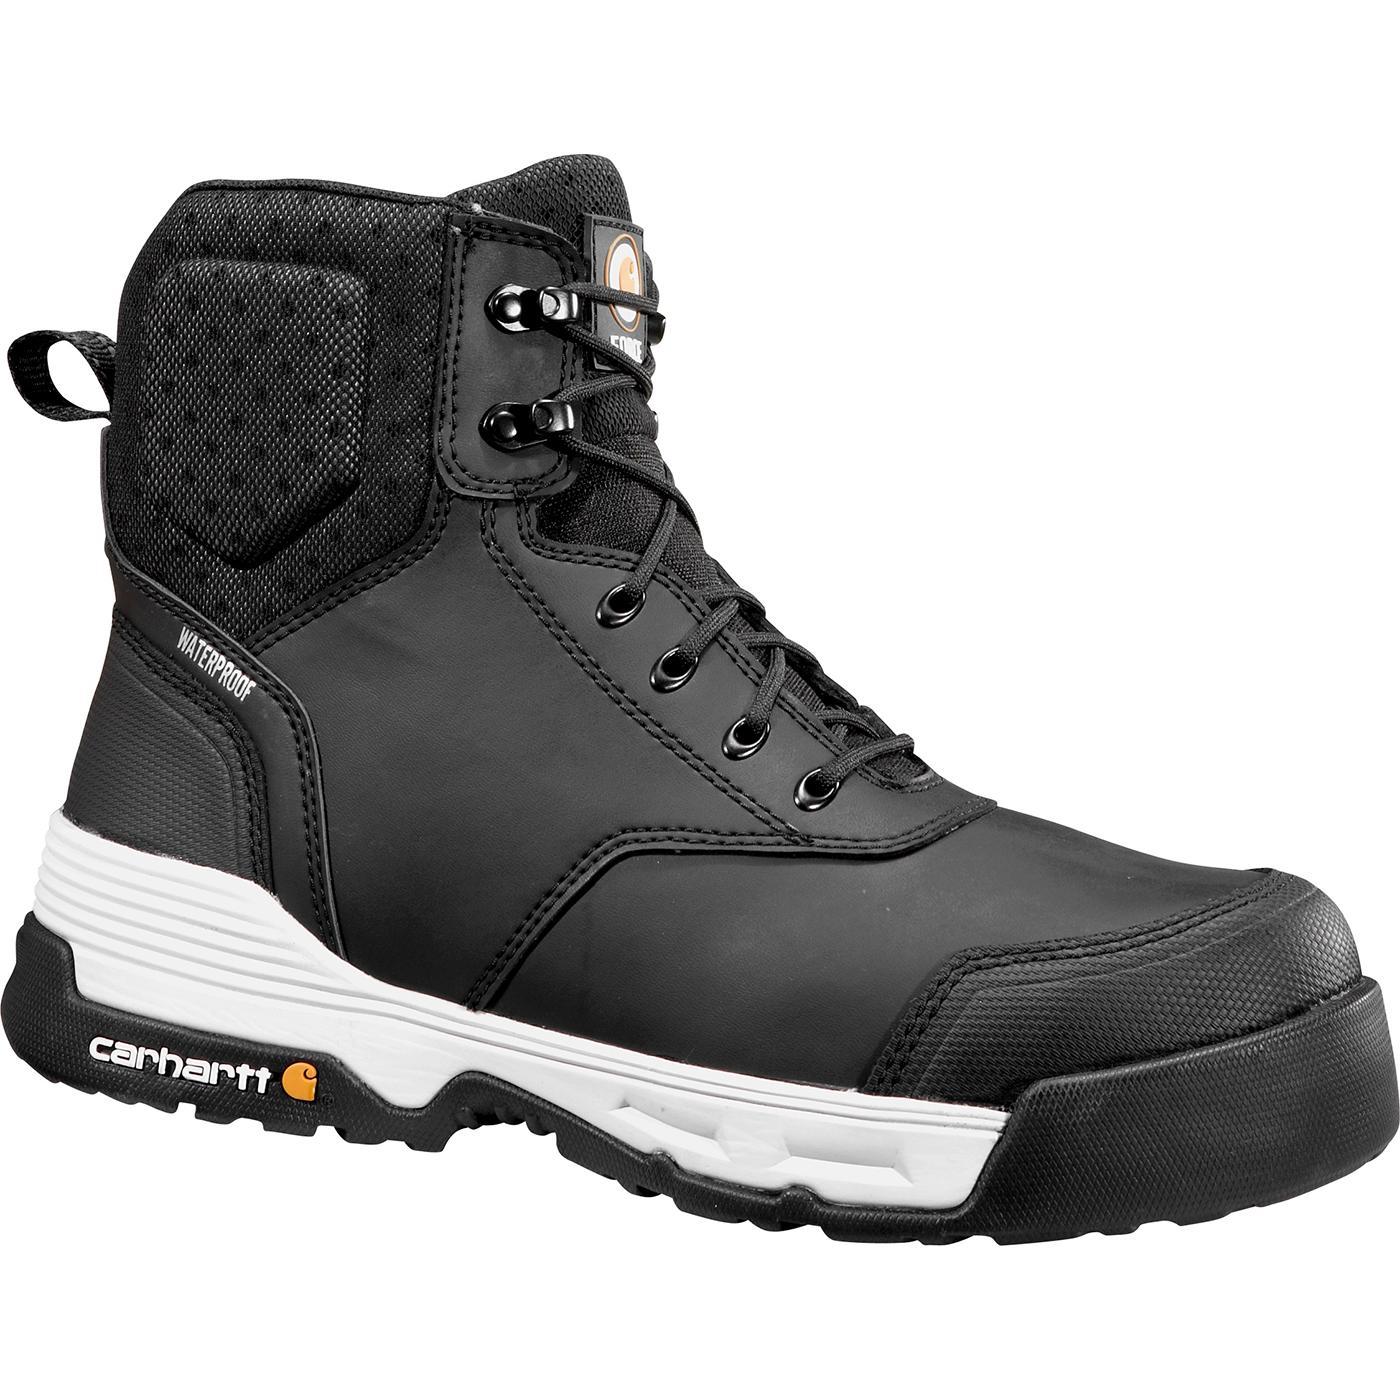 9a6113e95a0 Carhartt Force Composite Toe Waterproof Work BootCarhartt Force Composite  Toe Waterproof Work Boot,